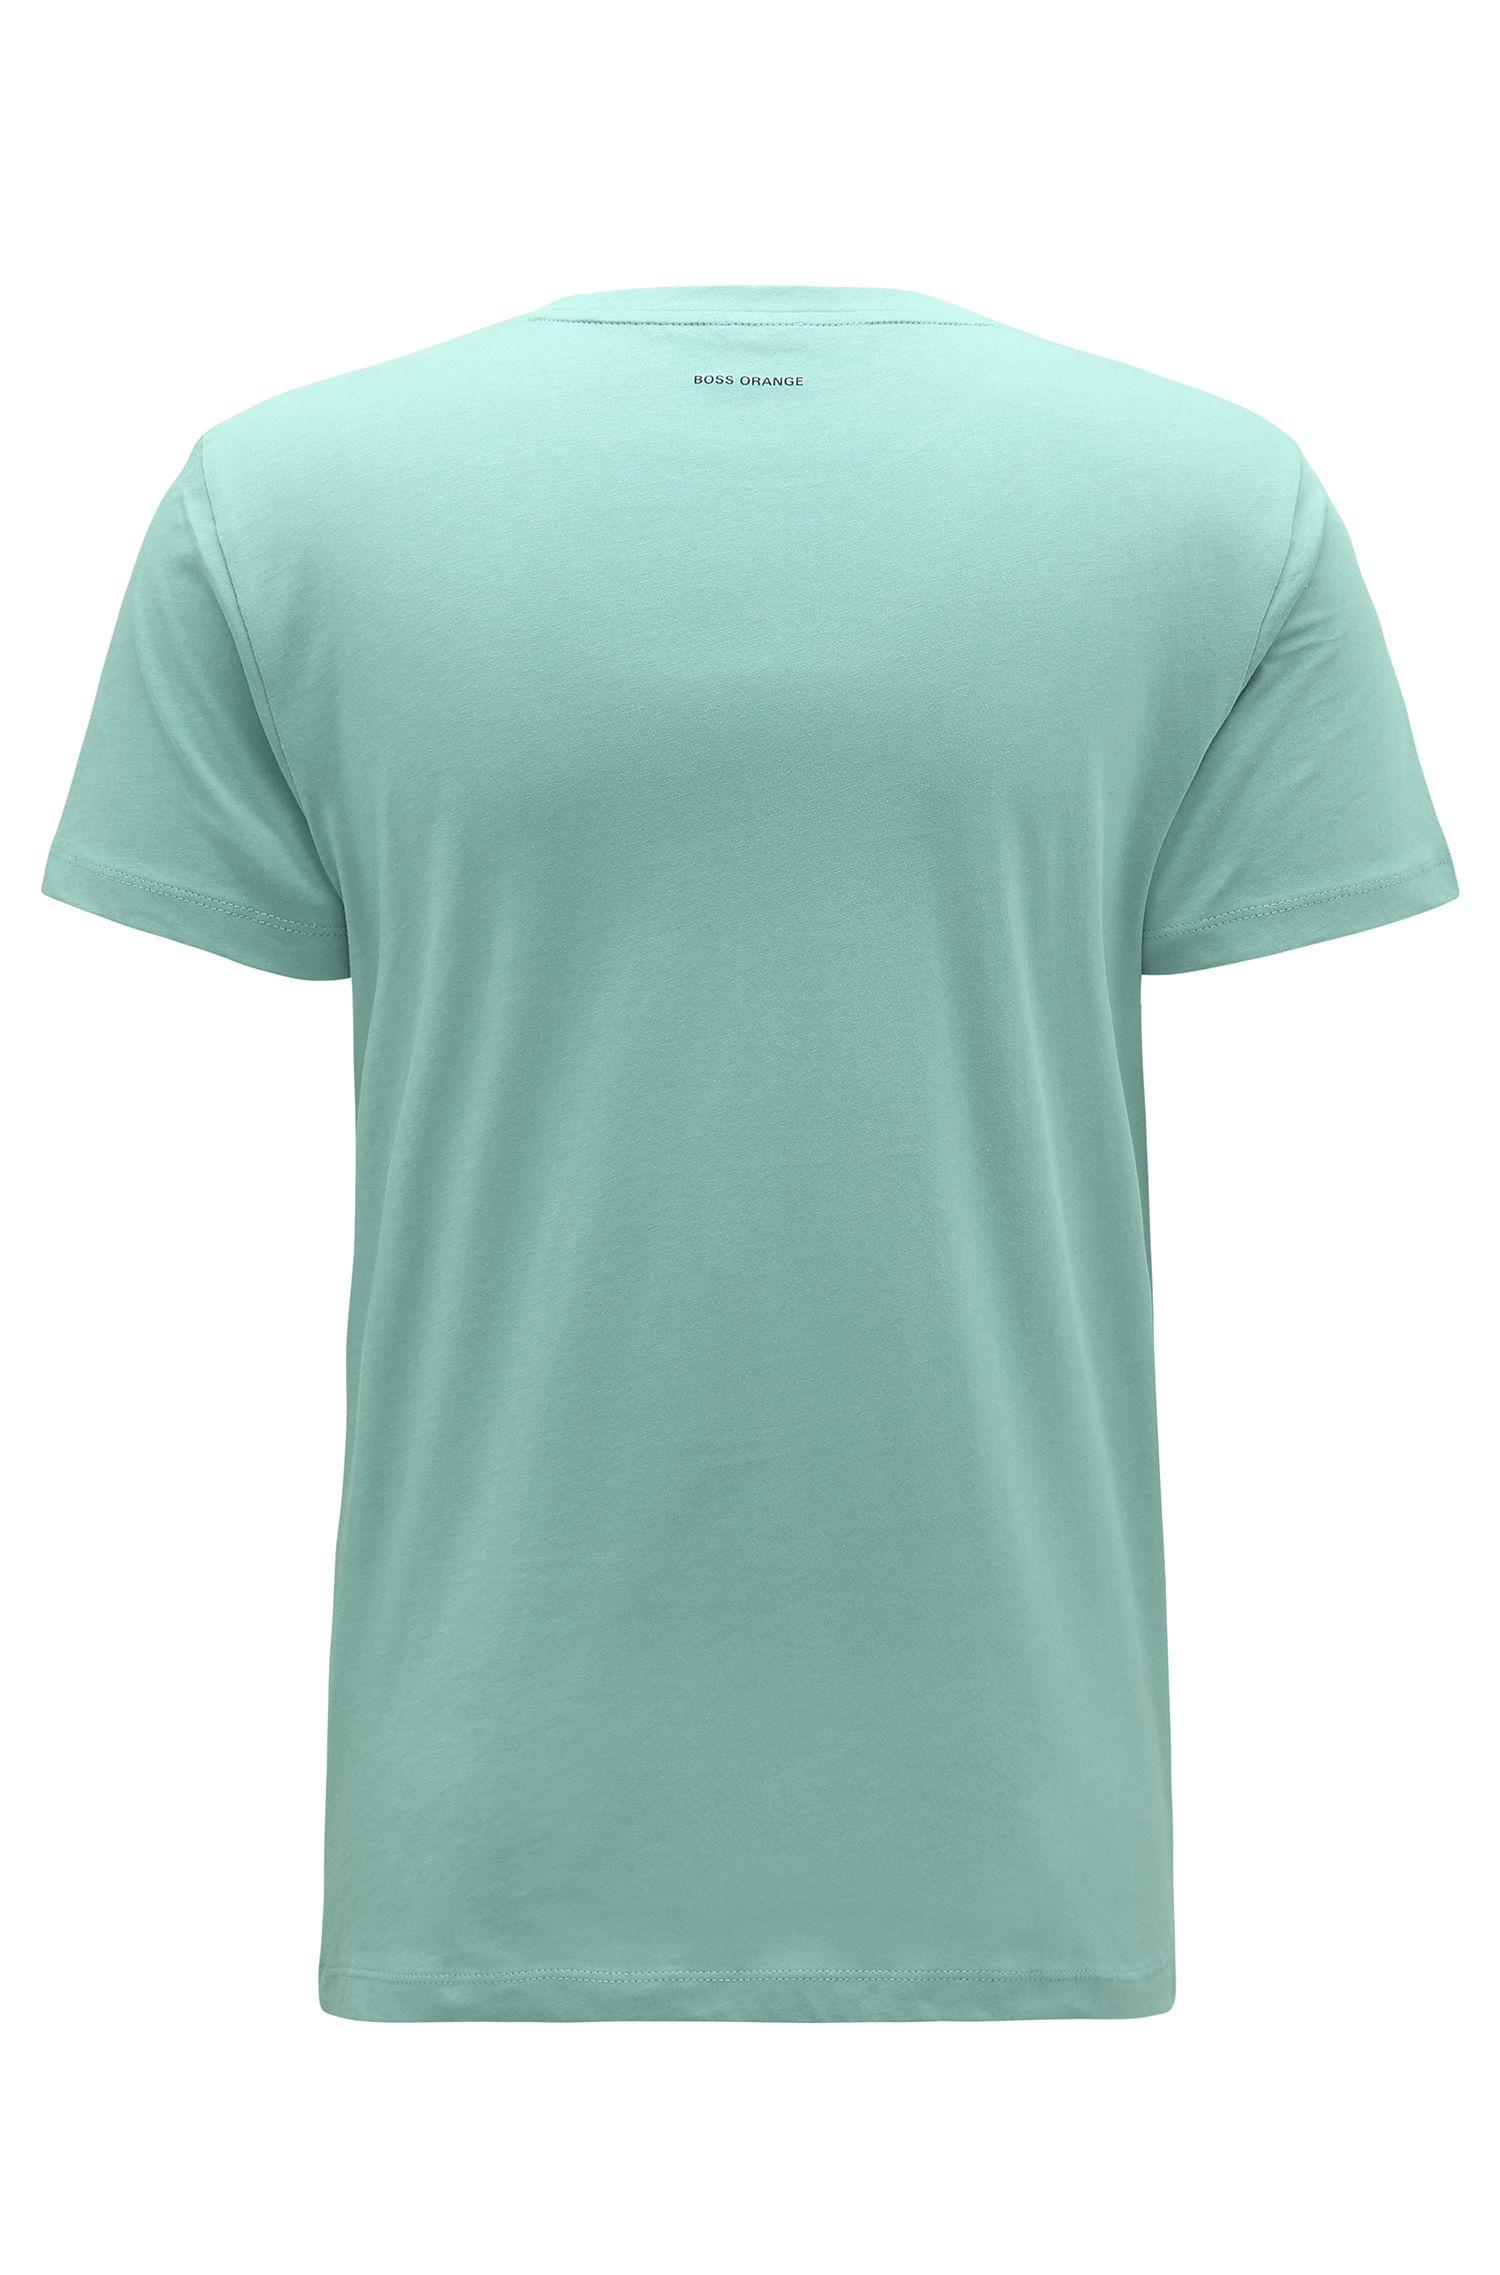 Cotton Graphic T-Shirt | Turbulence, Turquoise